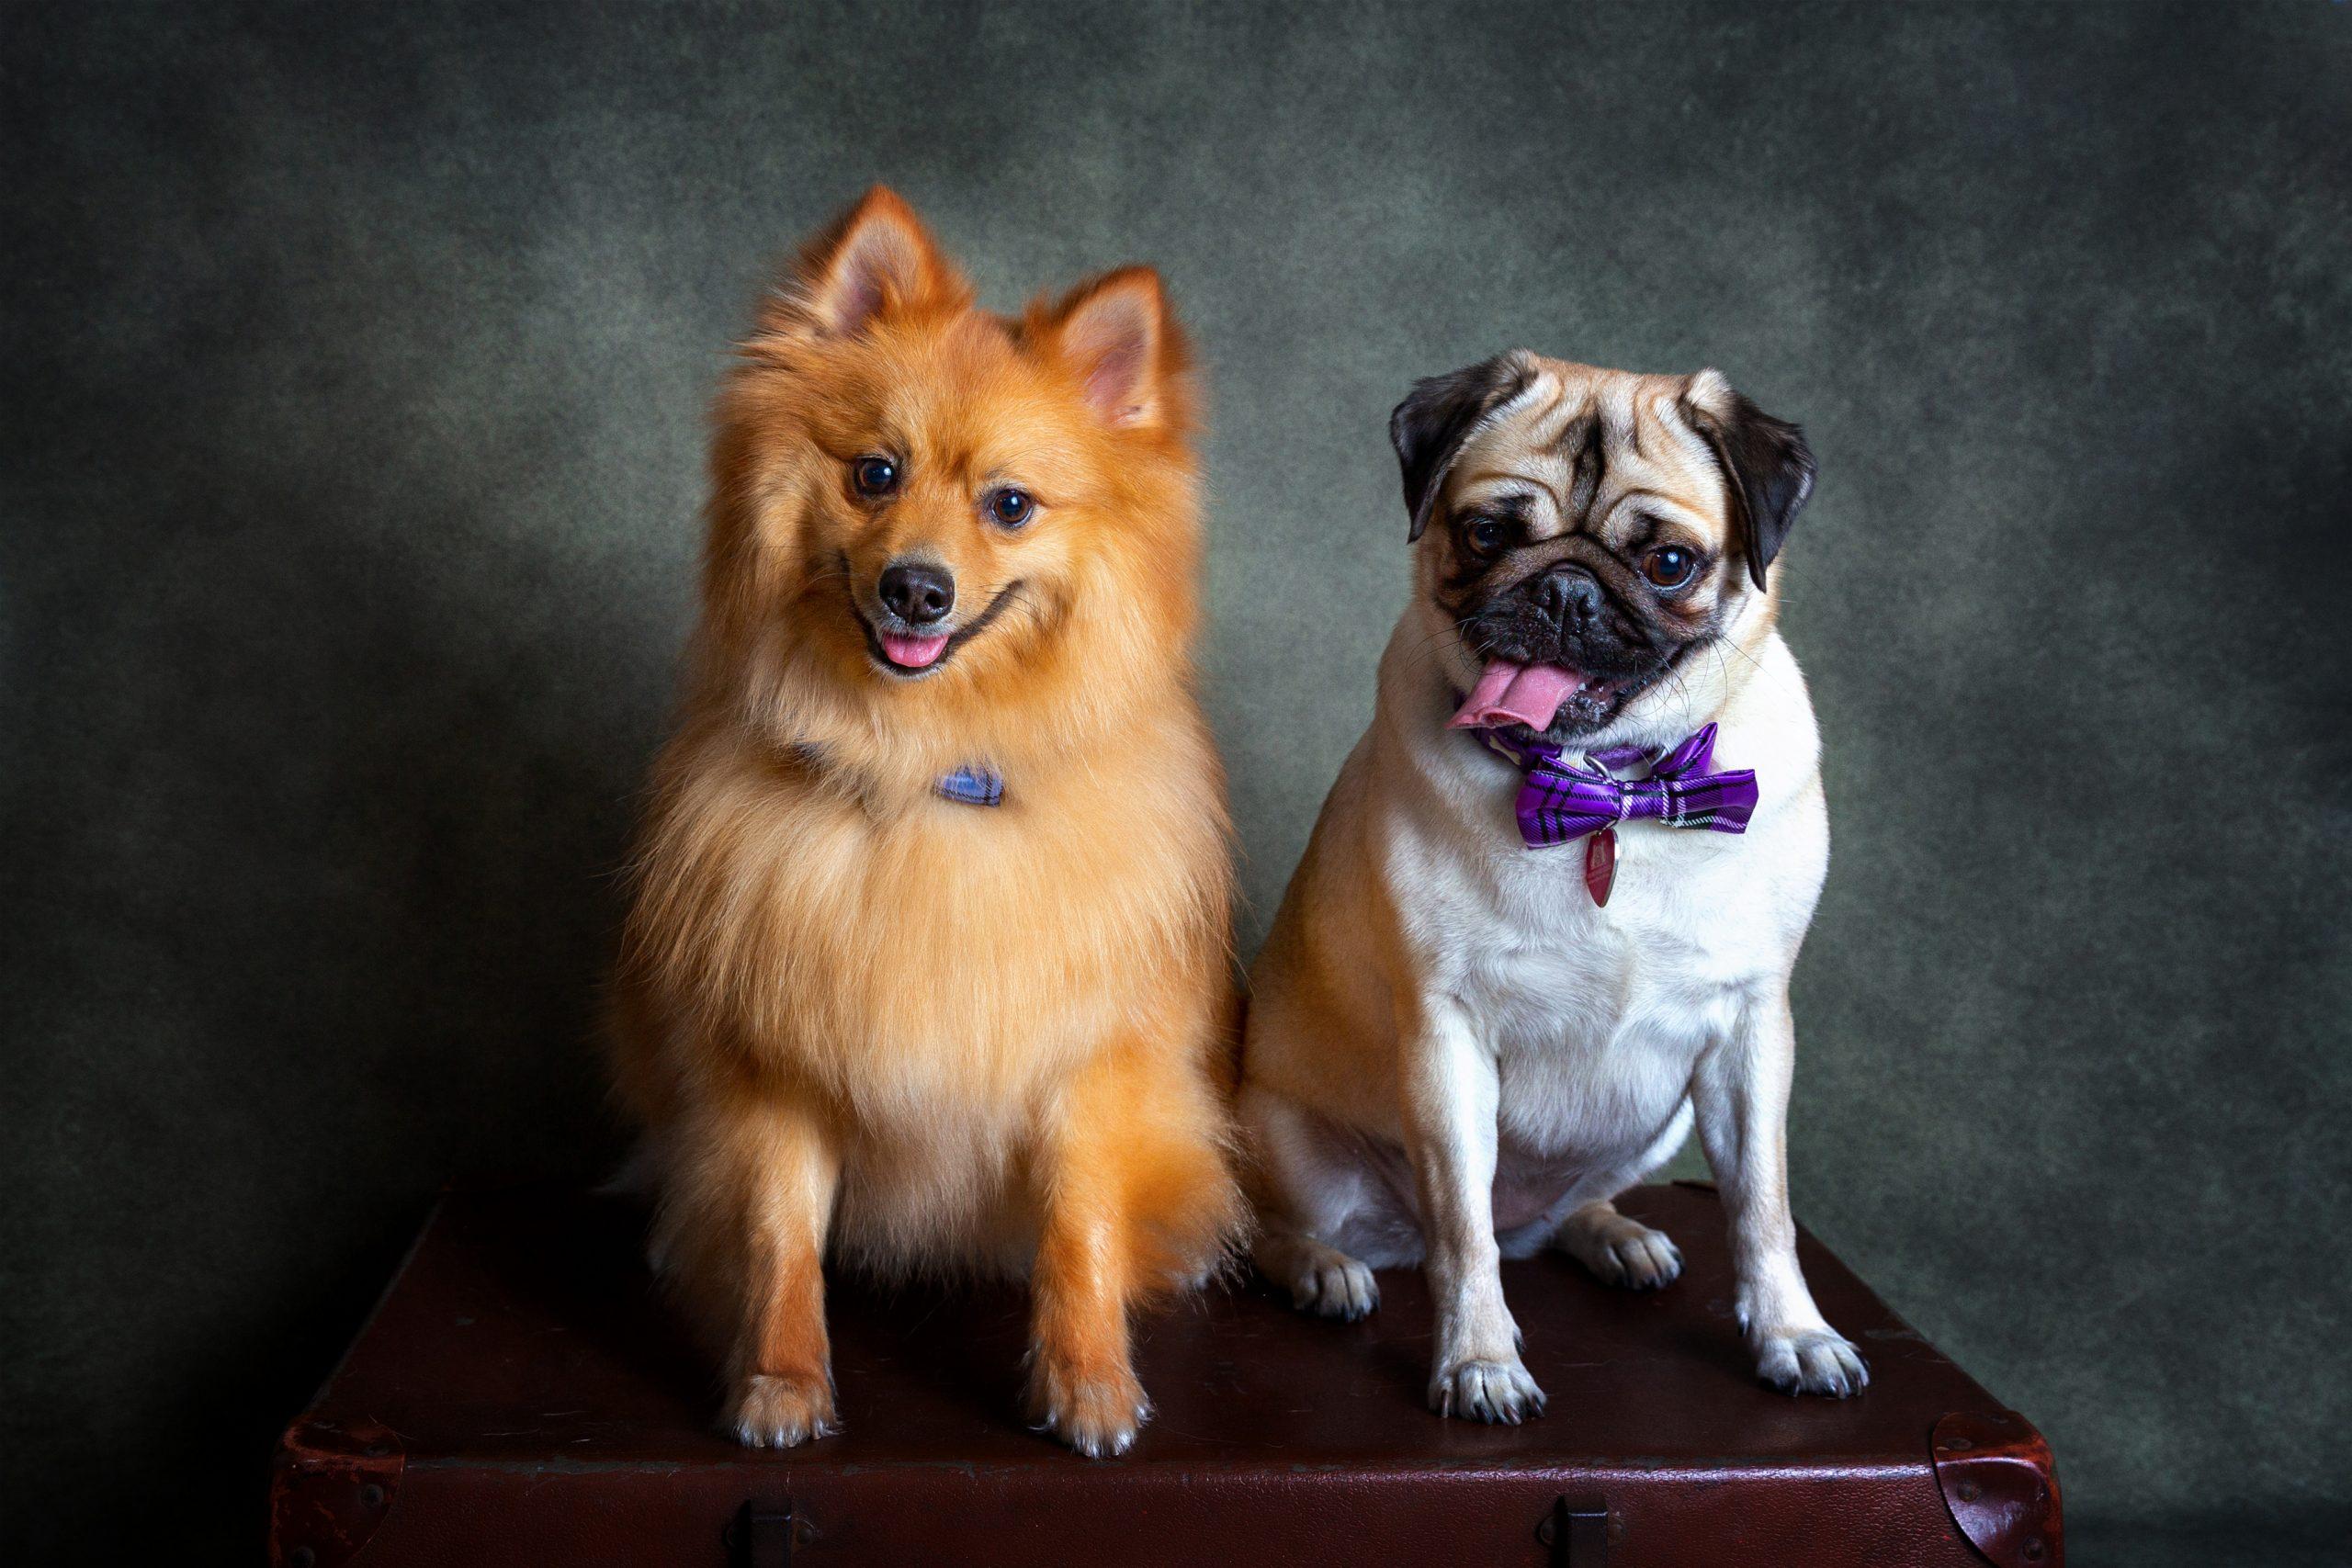 Dog Gallery Julia Healey Photography Pet Pawtrait Photographer